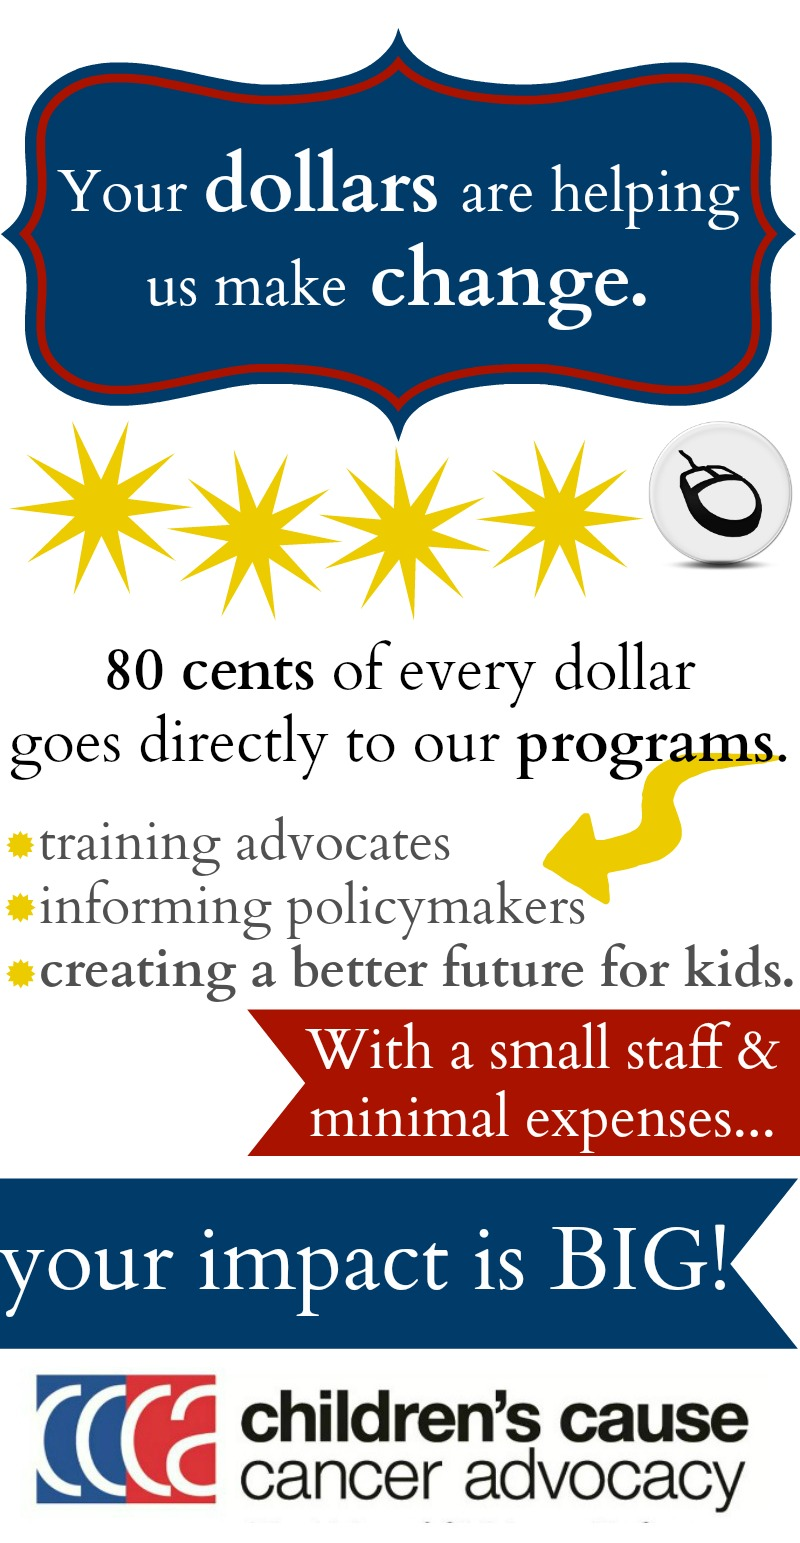 ccca-infographic-dollarsv2